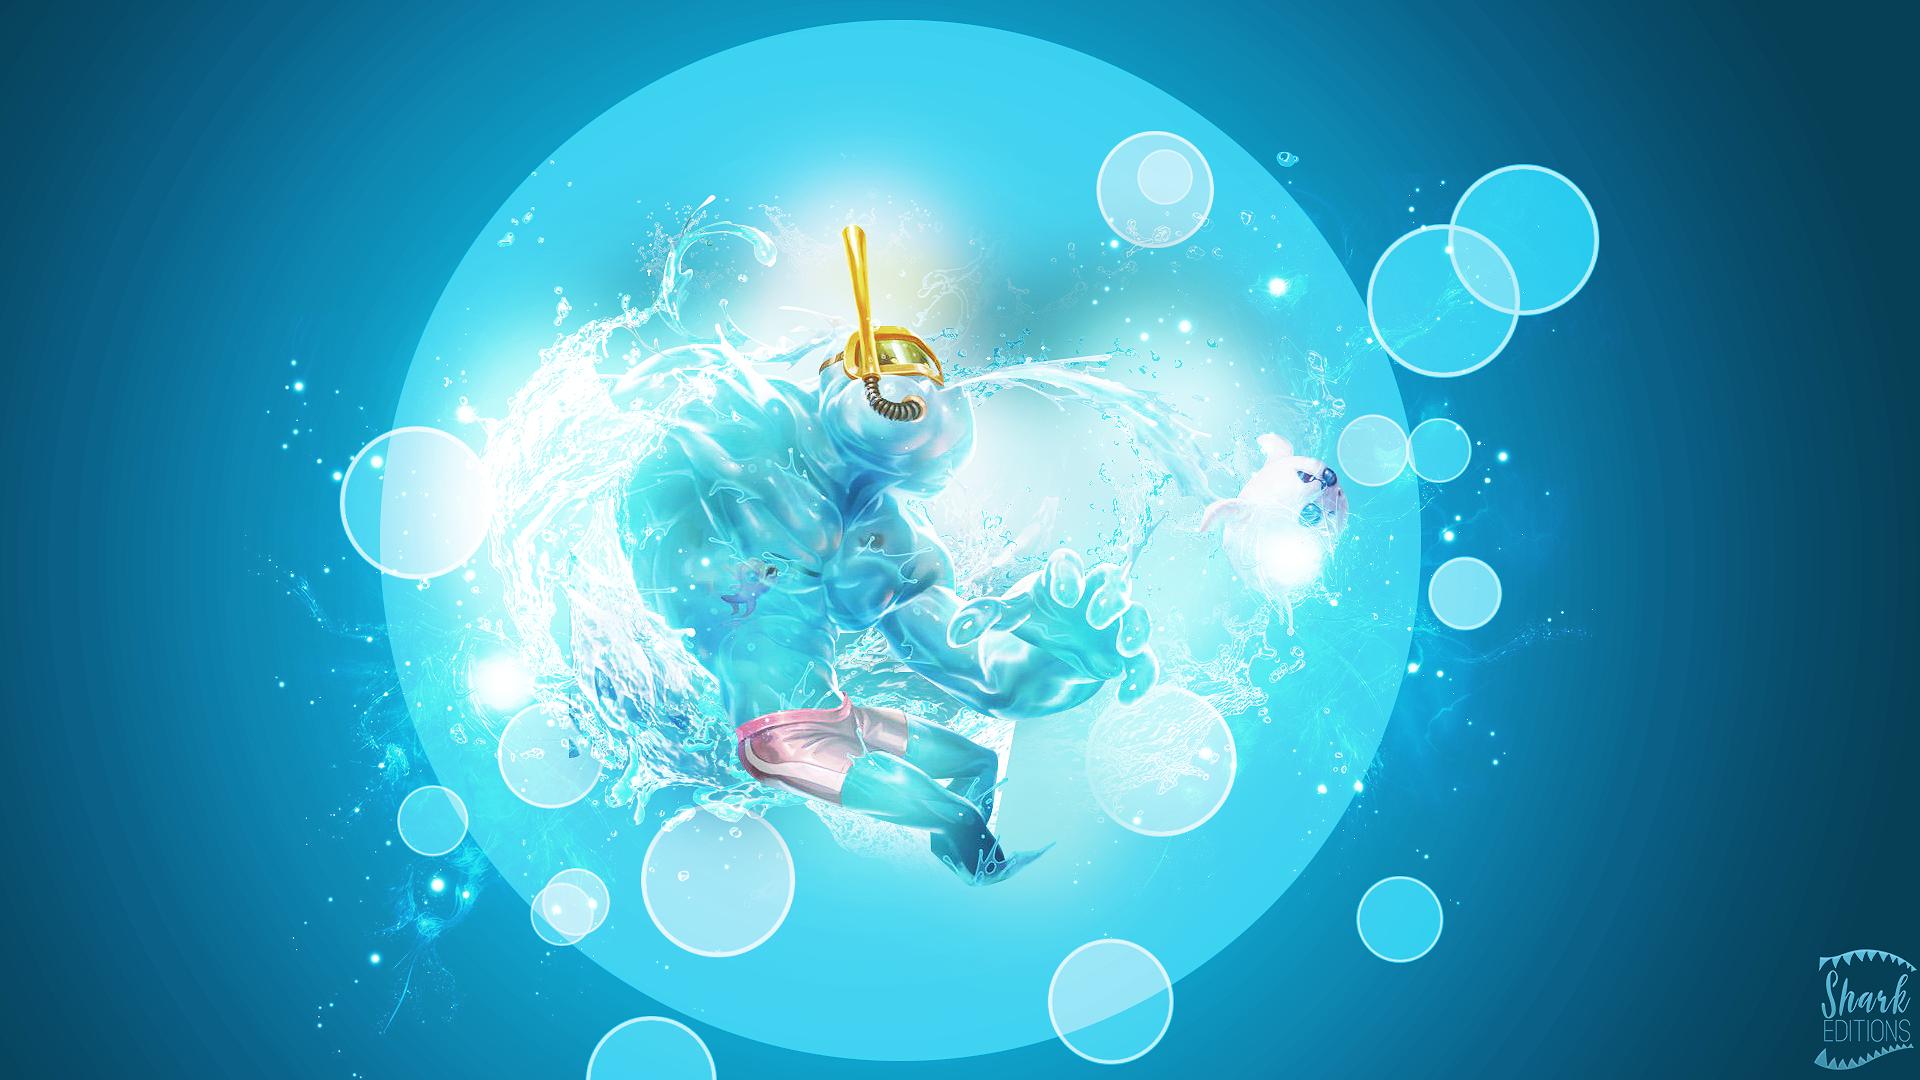 Pool Party Zac Wallpaper League Of Legends By Leftlucy On Deviantart